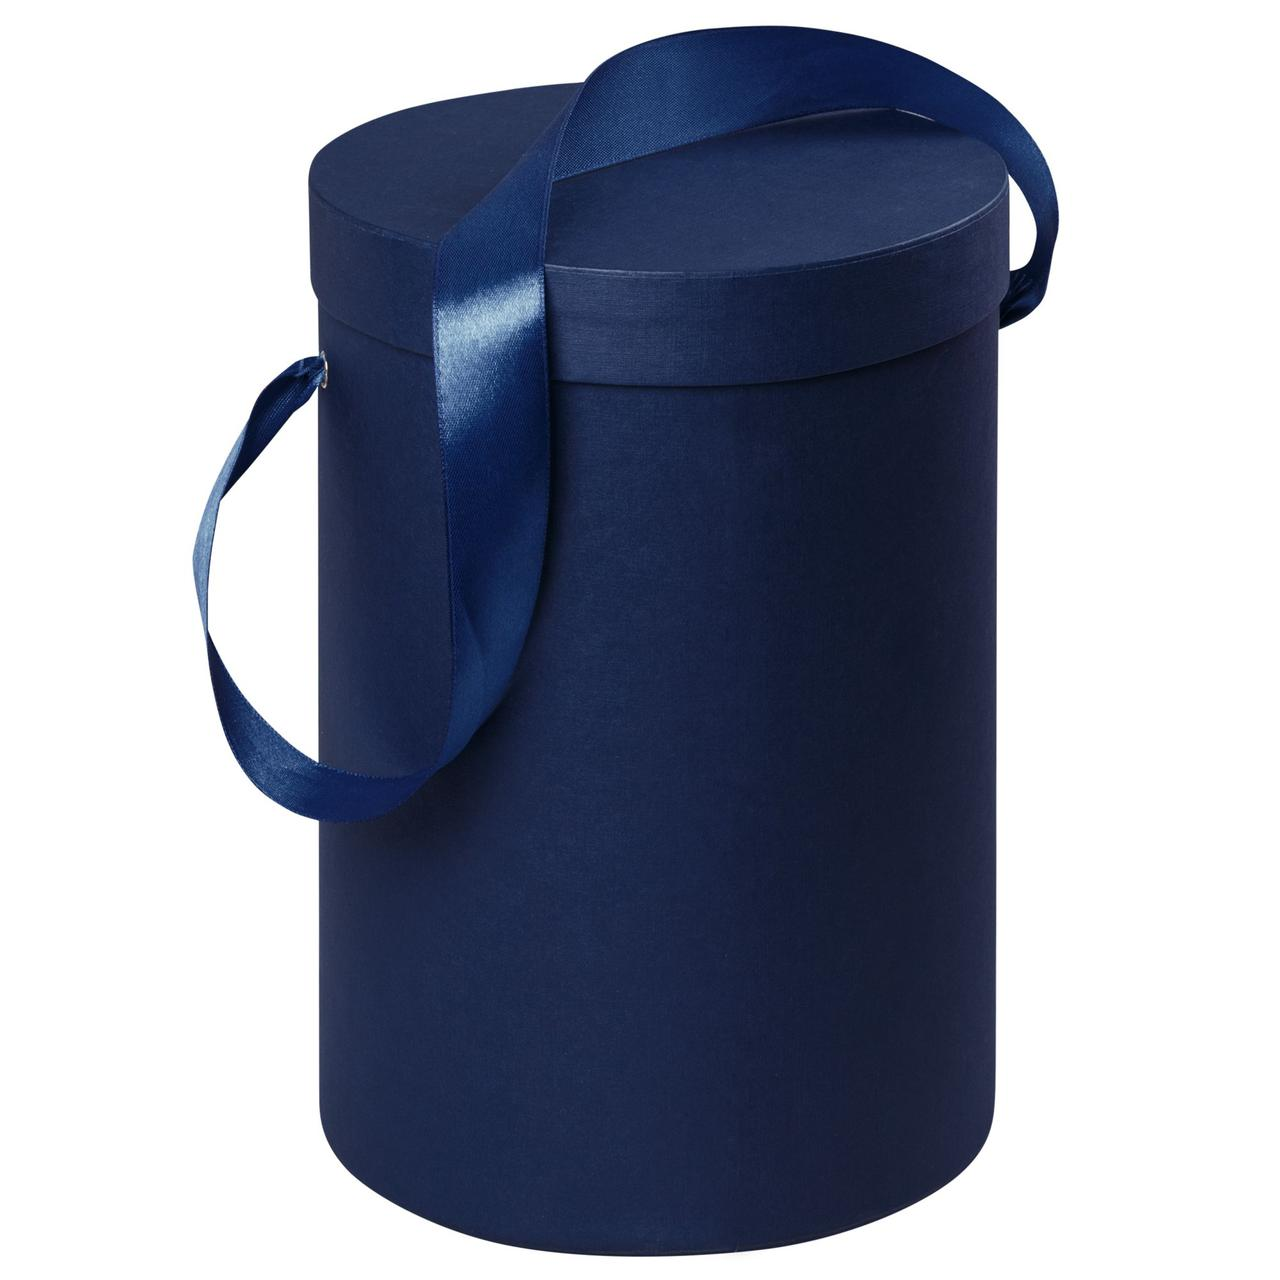 Подарочная коробка Rond, синяя